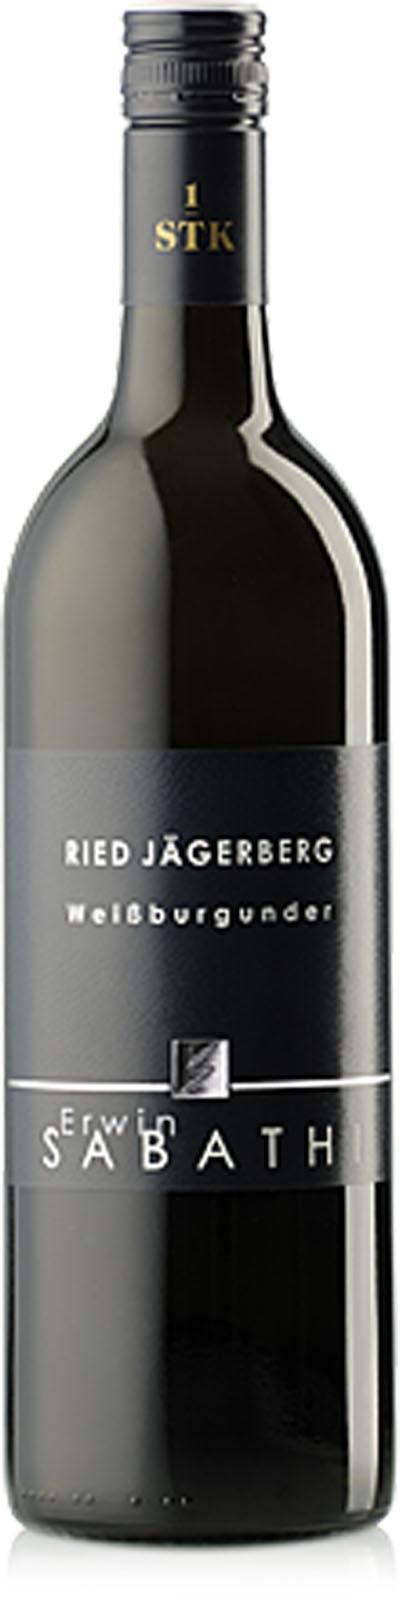 Weißburgunder Jägerberg DAC 2018 / Sabathi Erwin